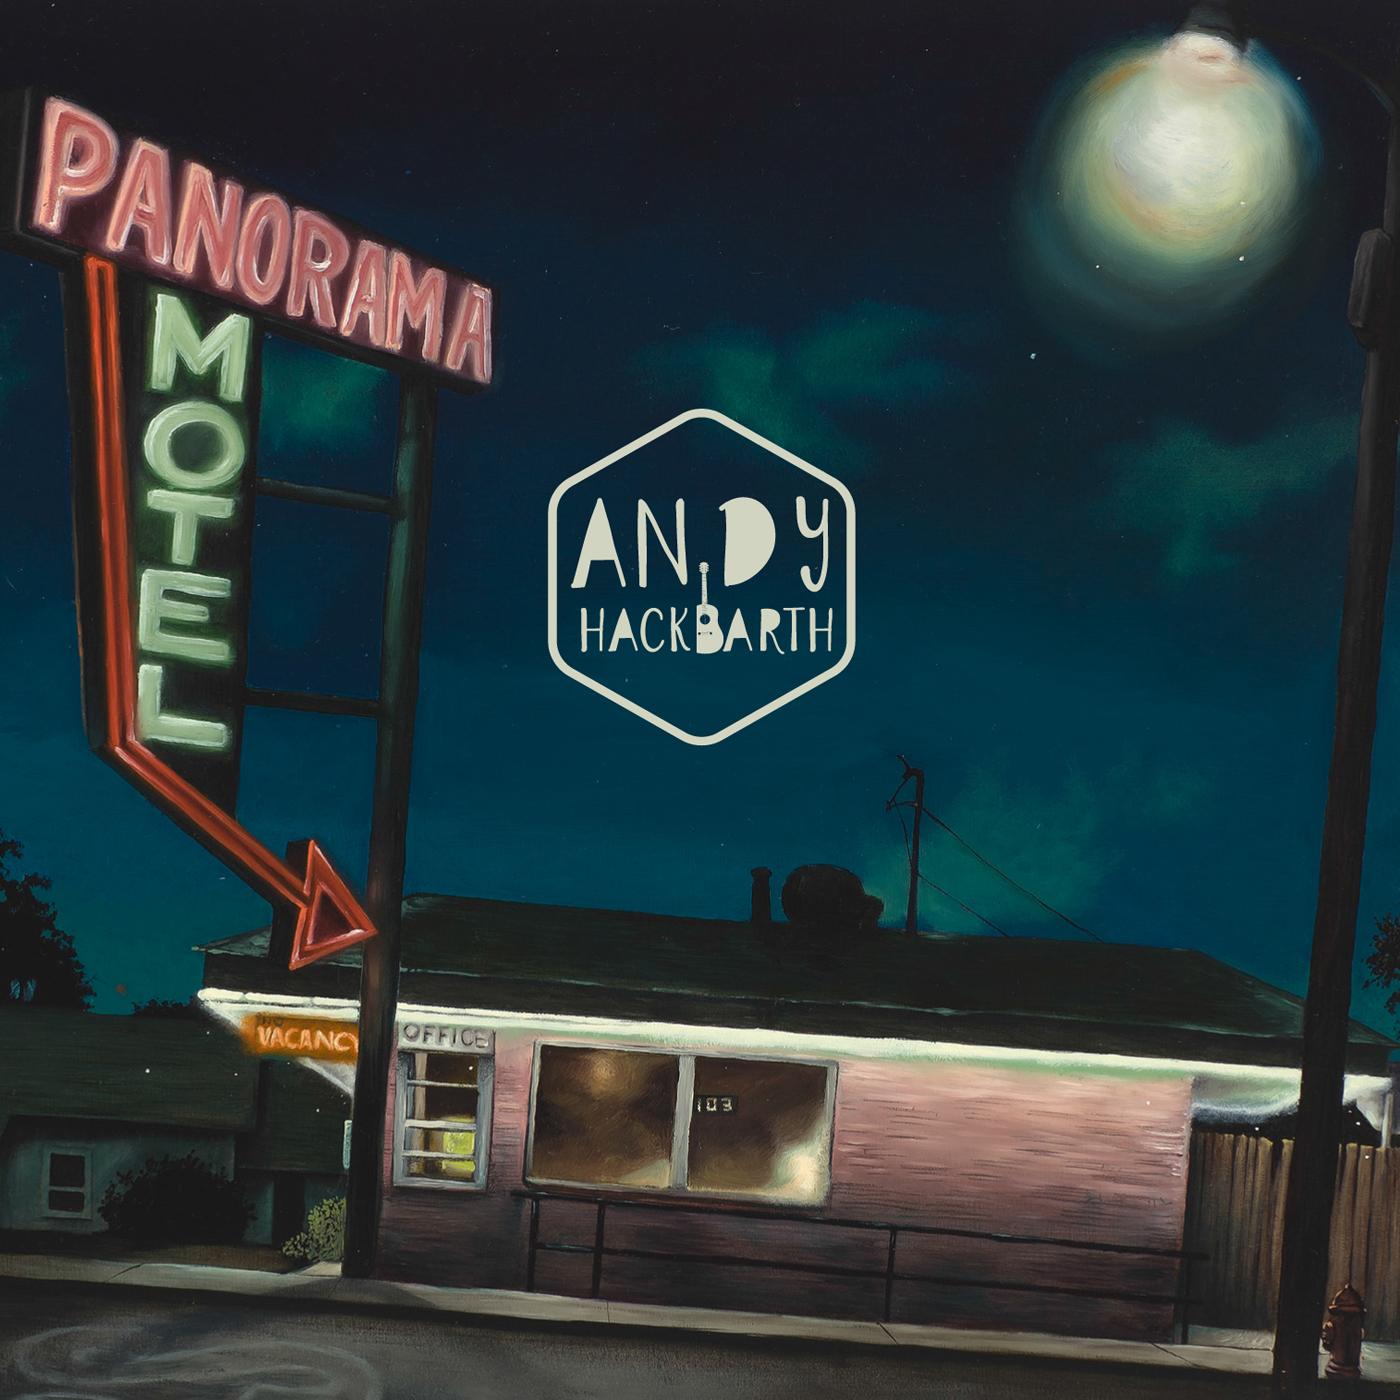 Panorama Motel Cover for Digital Distribution.jpg